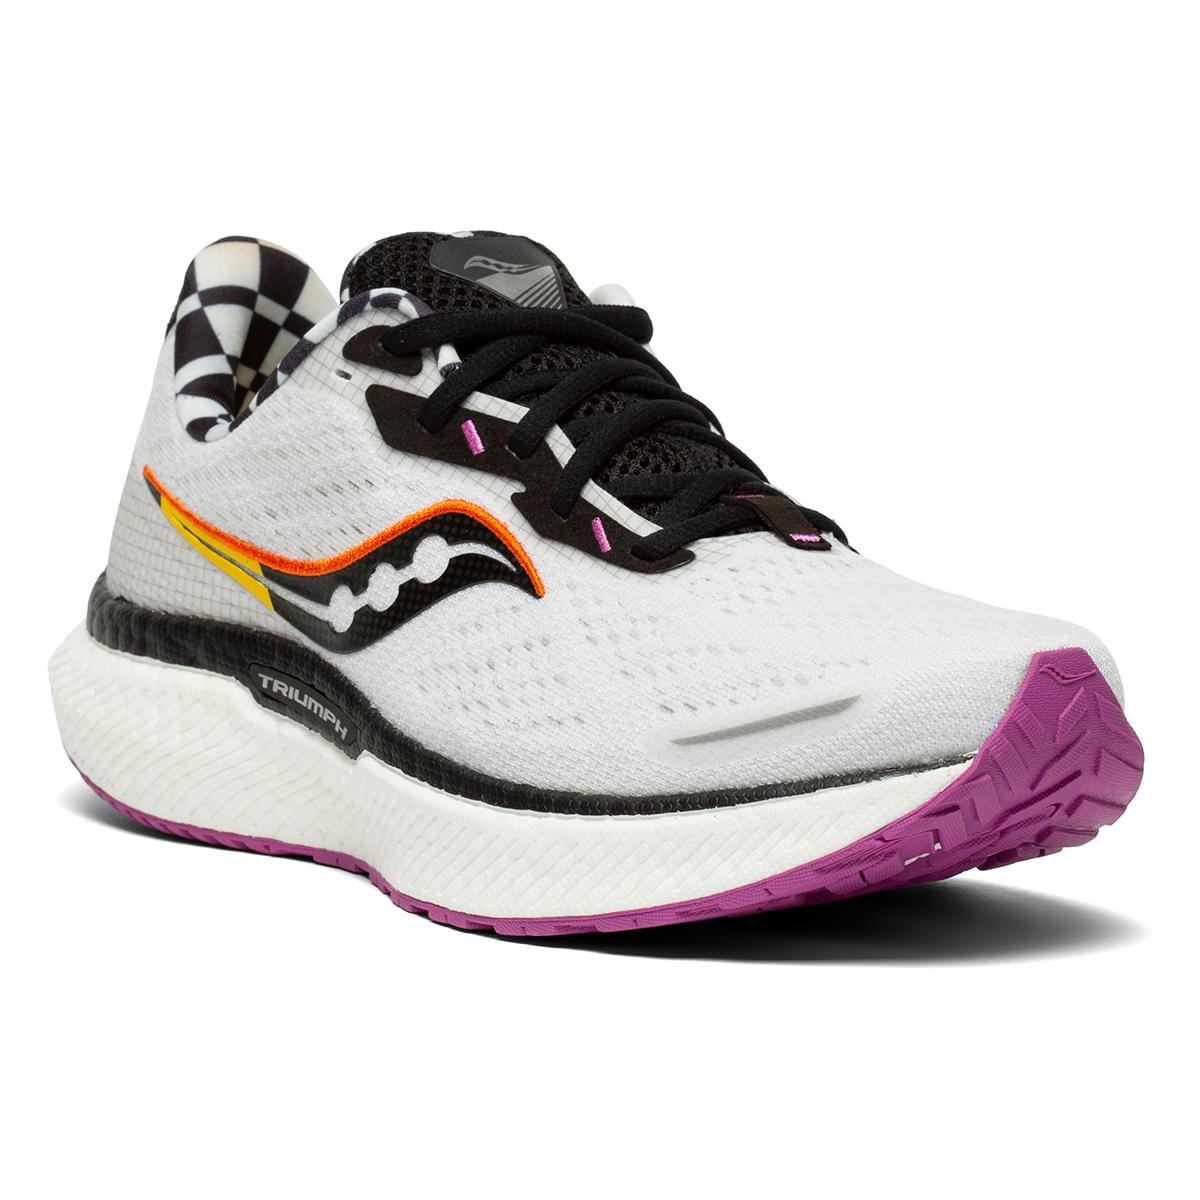 Women's Saucony Triumph 19 Running Shoe, , large, image 3